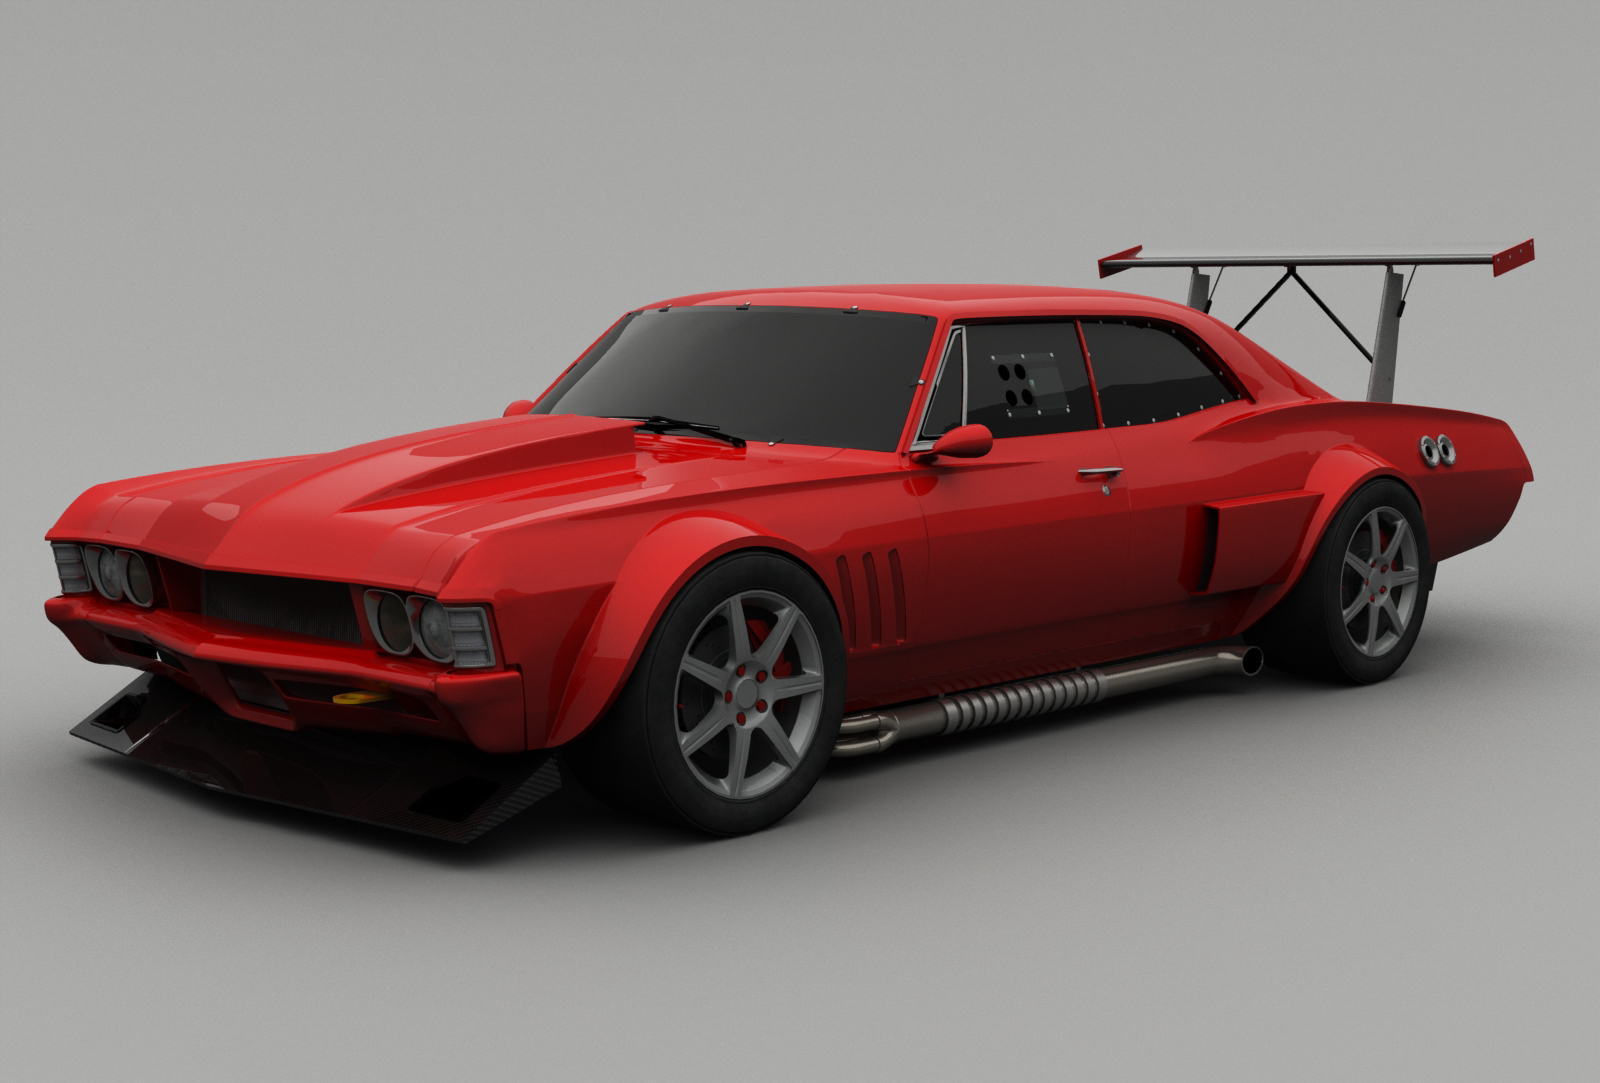 2013-03_The Crew_F.Beudin_Chevrolet Impala-1967-Racing_05